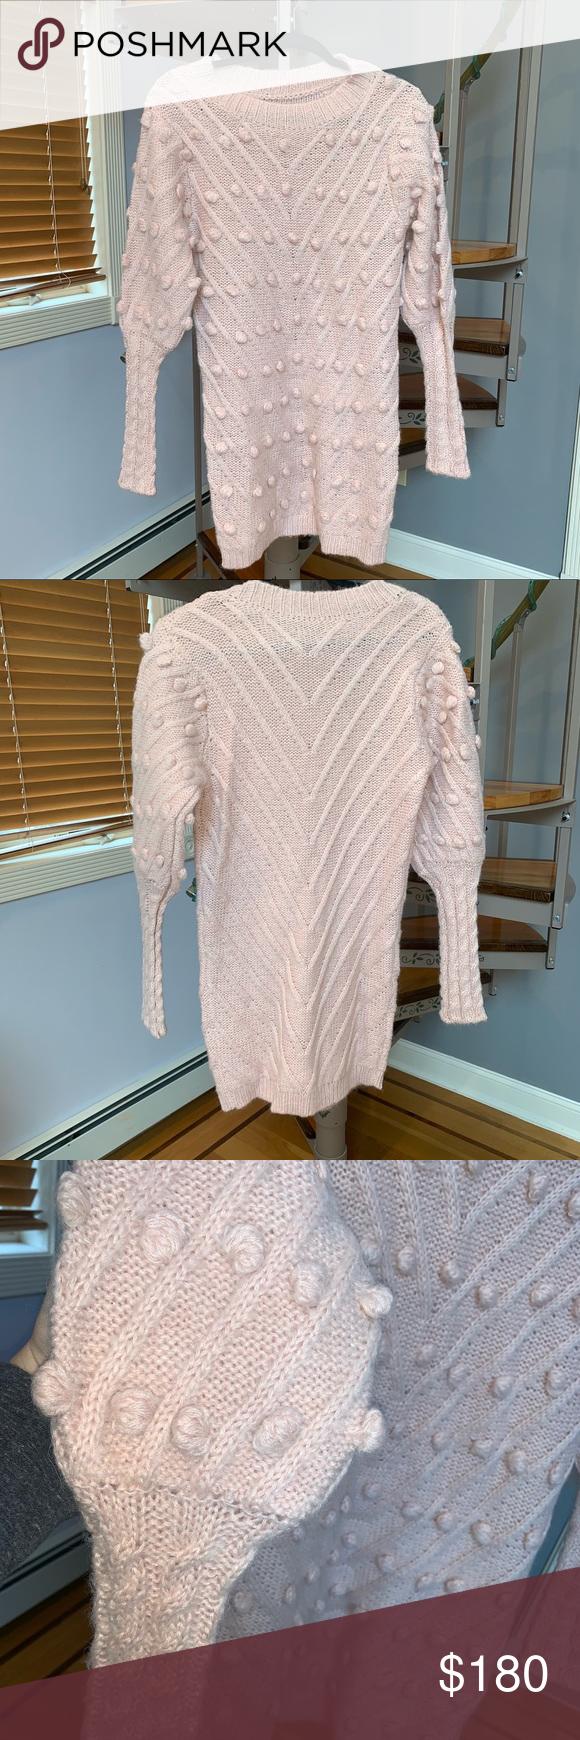 bb6a081df7e Zimmermann like fleeting bauble puff sweater dress Zimmermann like fleeting  puff bauble sweater pink dress size medium 2 (6-8) Dresses Mini